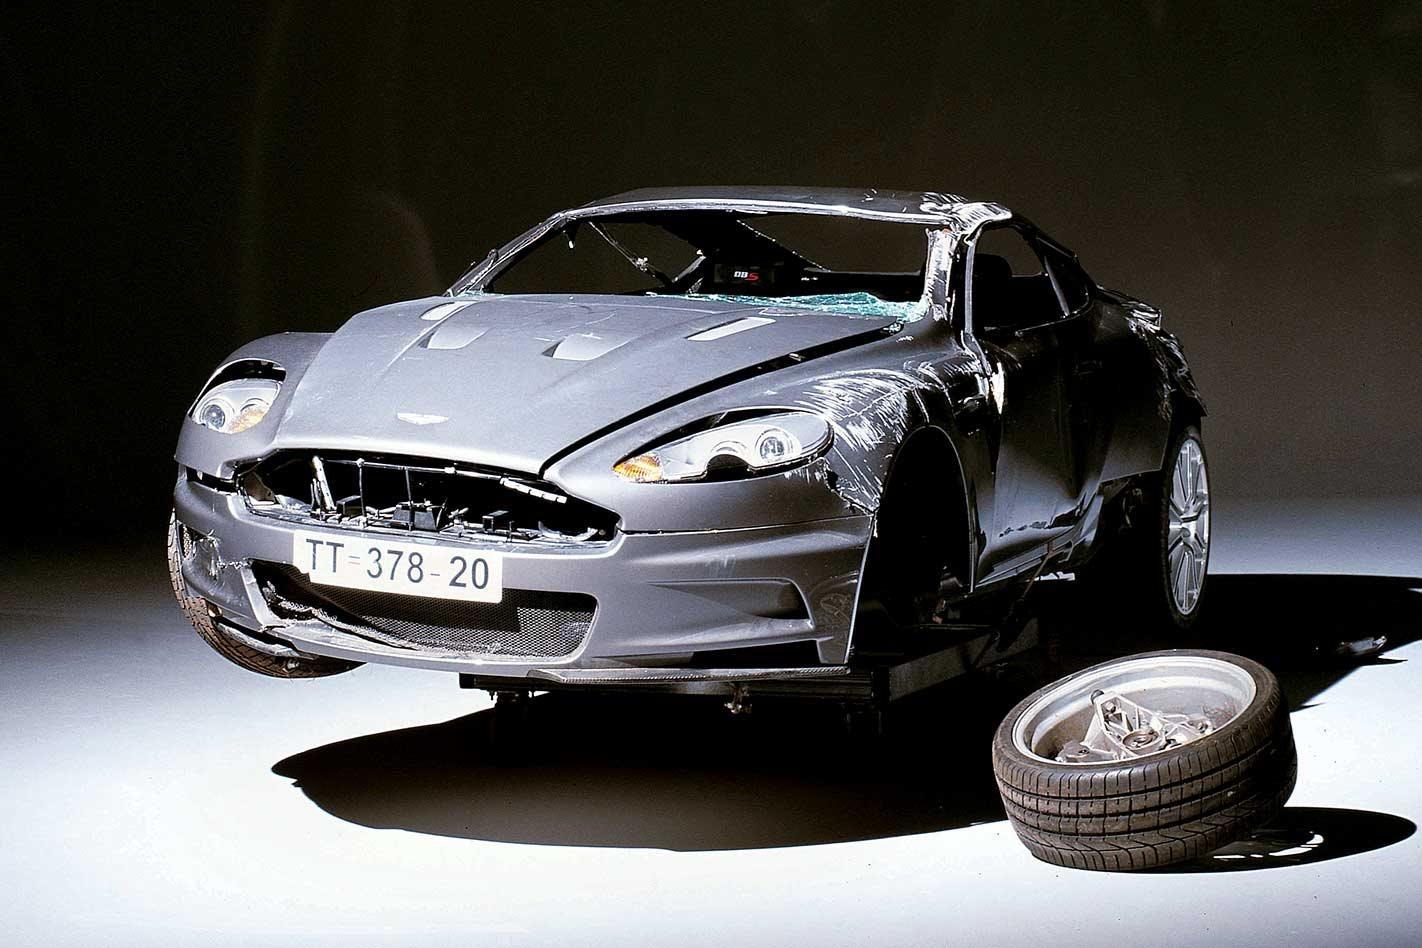 The Aston Martin Dbs Behind The James Bond Casino Royale Stunt